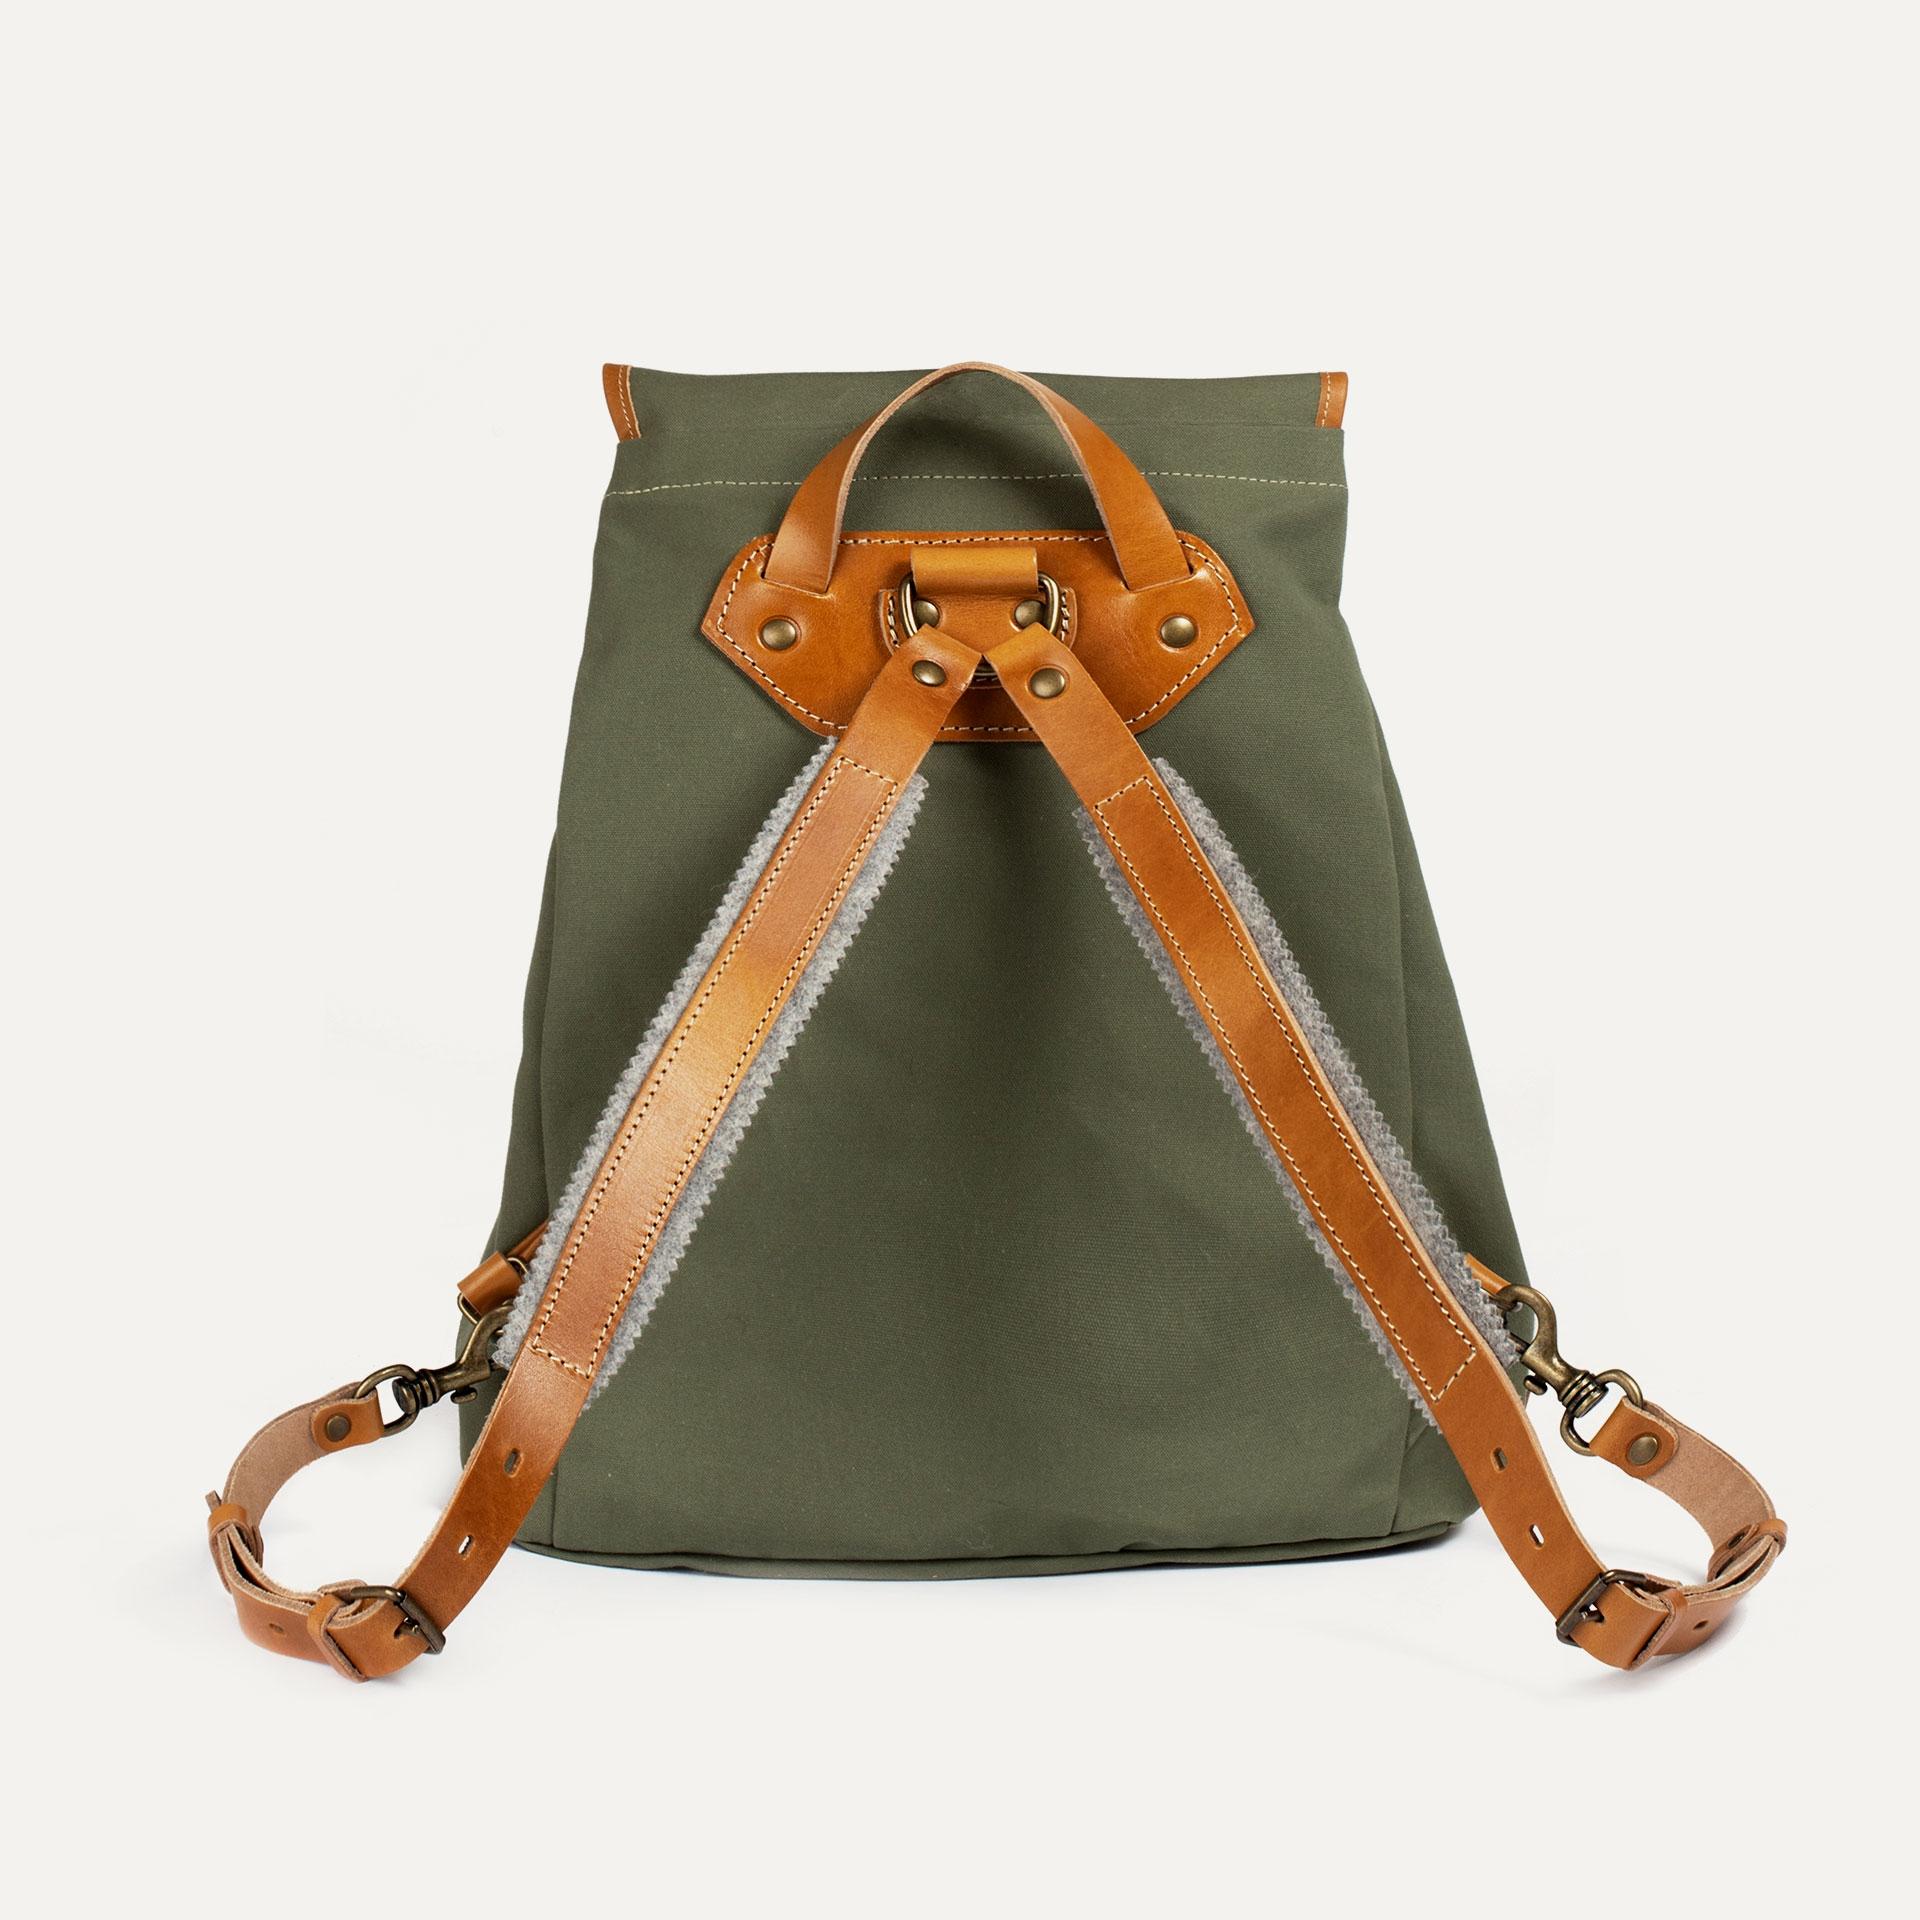 Camp backpack - Lichen Green (image n°3)